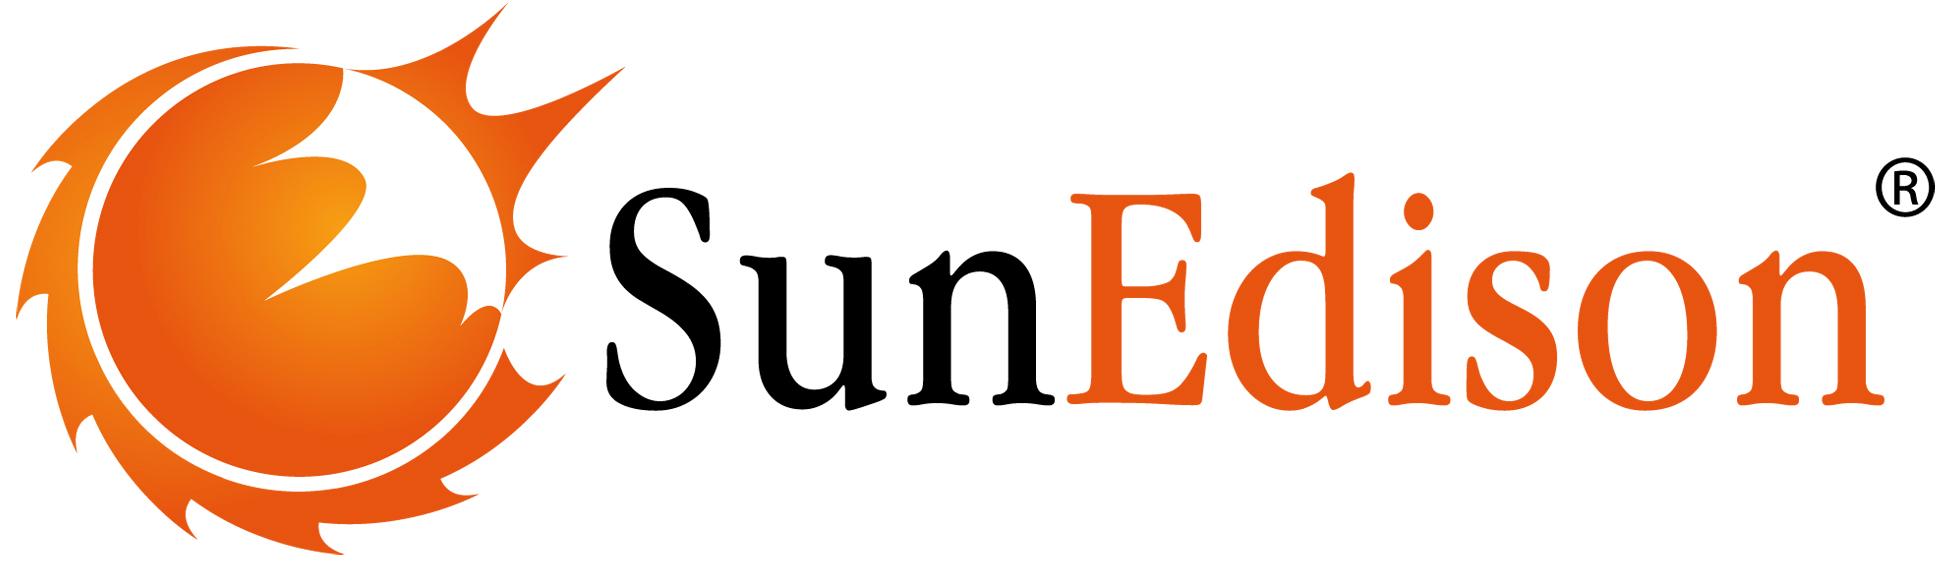 2013_05_22_SunEdison_Logo_Full-Color-high-res